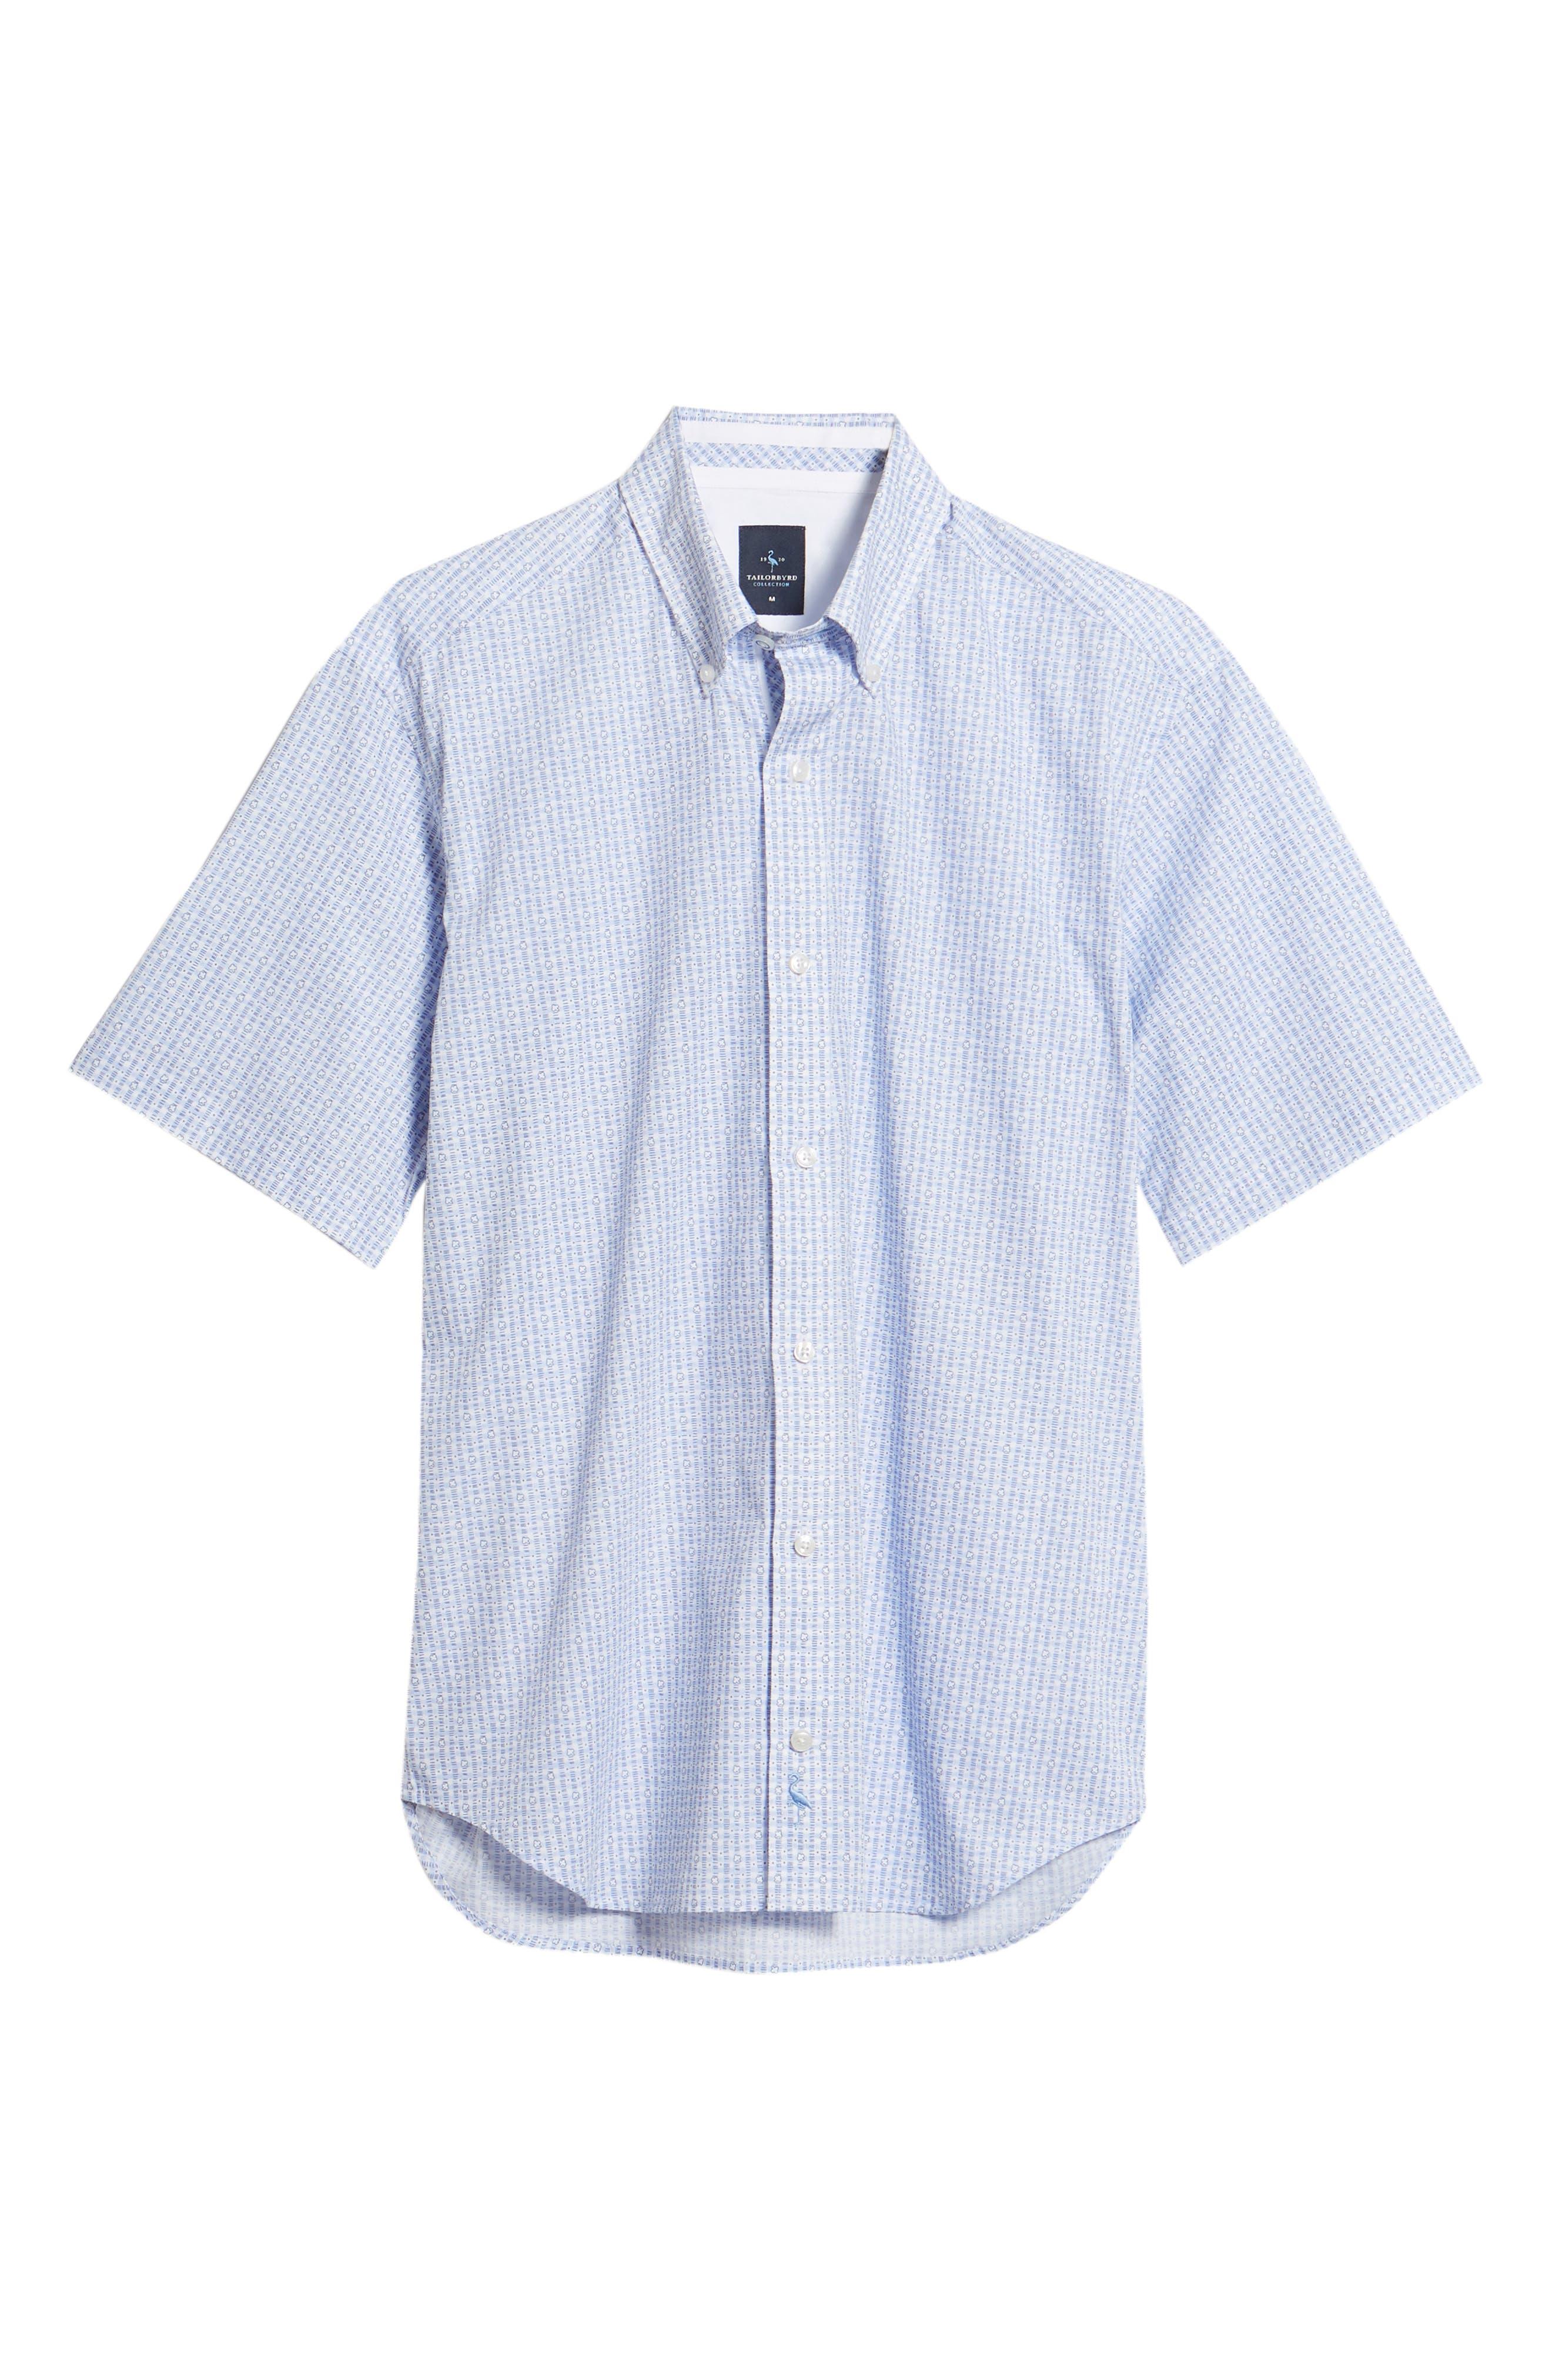 Arnie Regular Fit Sport Shirt,                             Alternate thumbnail 6, color,                             450